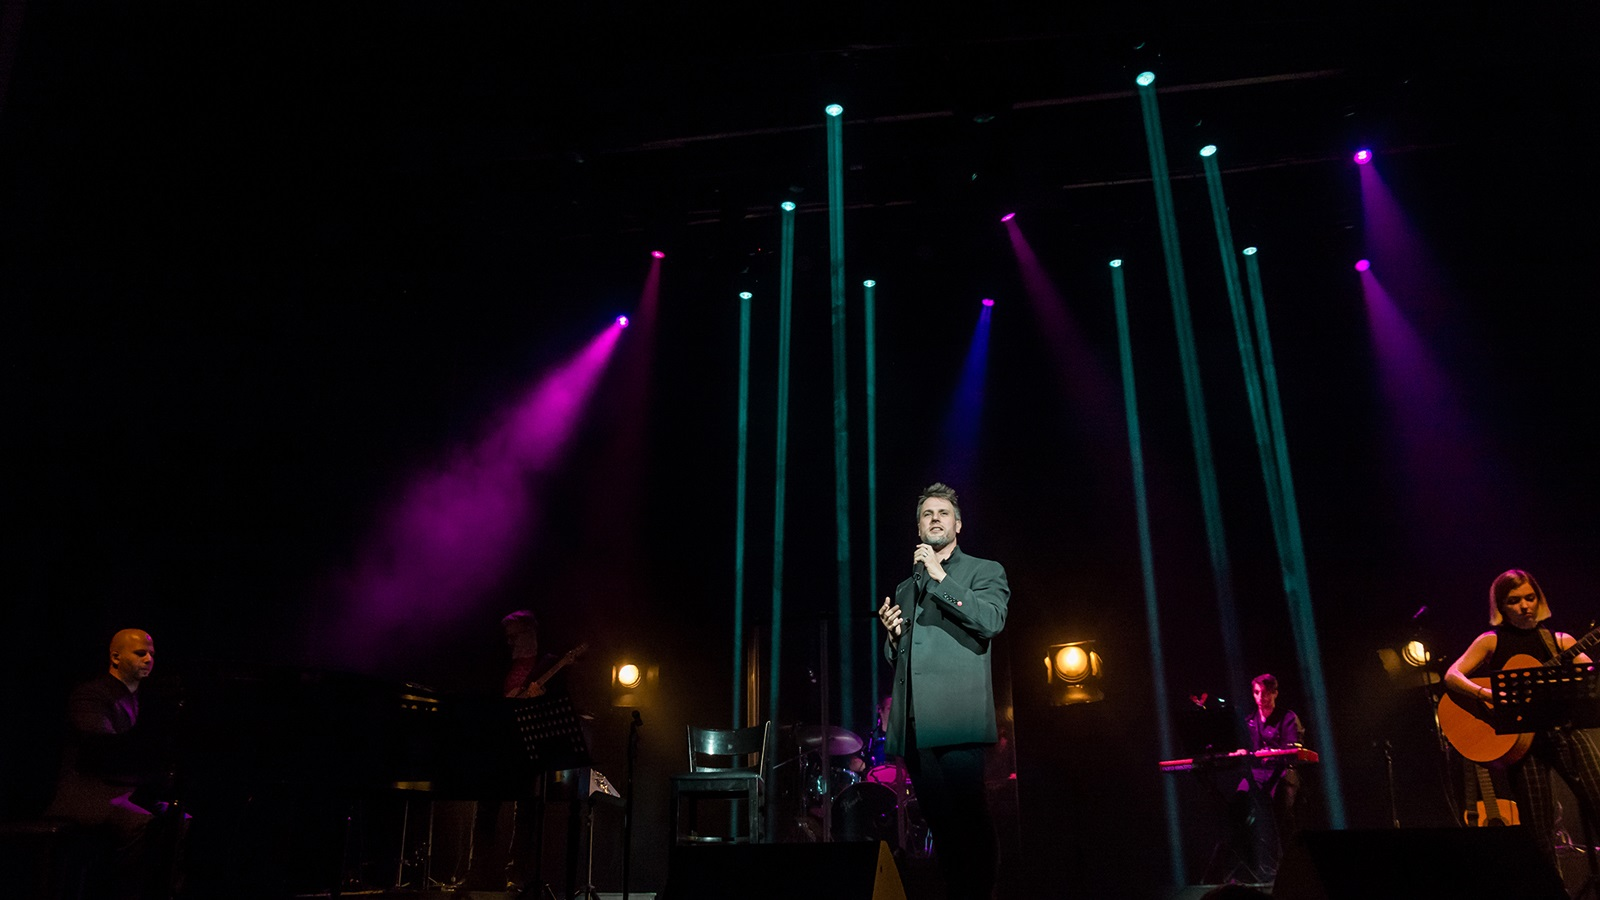 geronimo rauch en concert onyric teatre condal barcelona